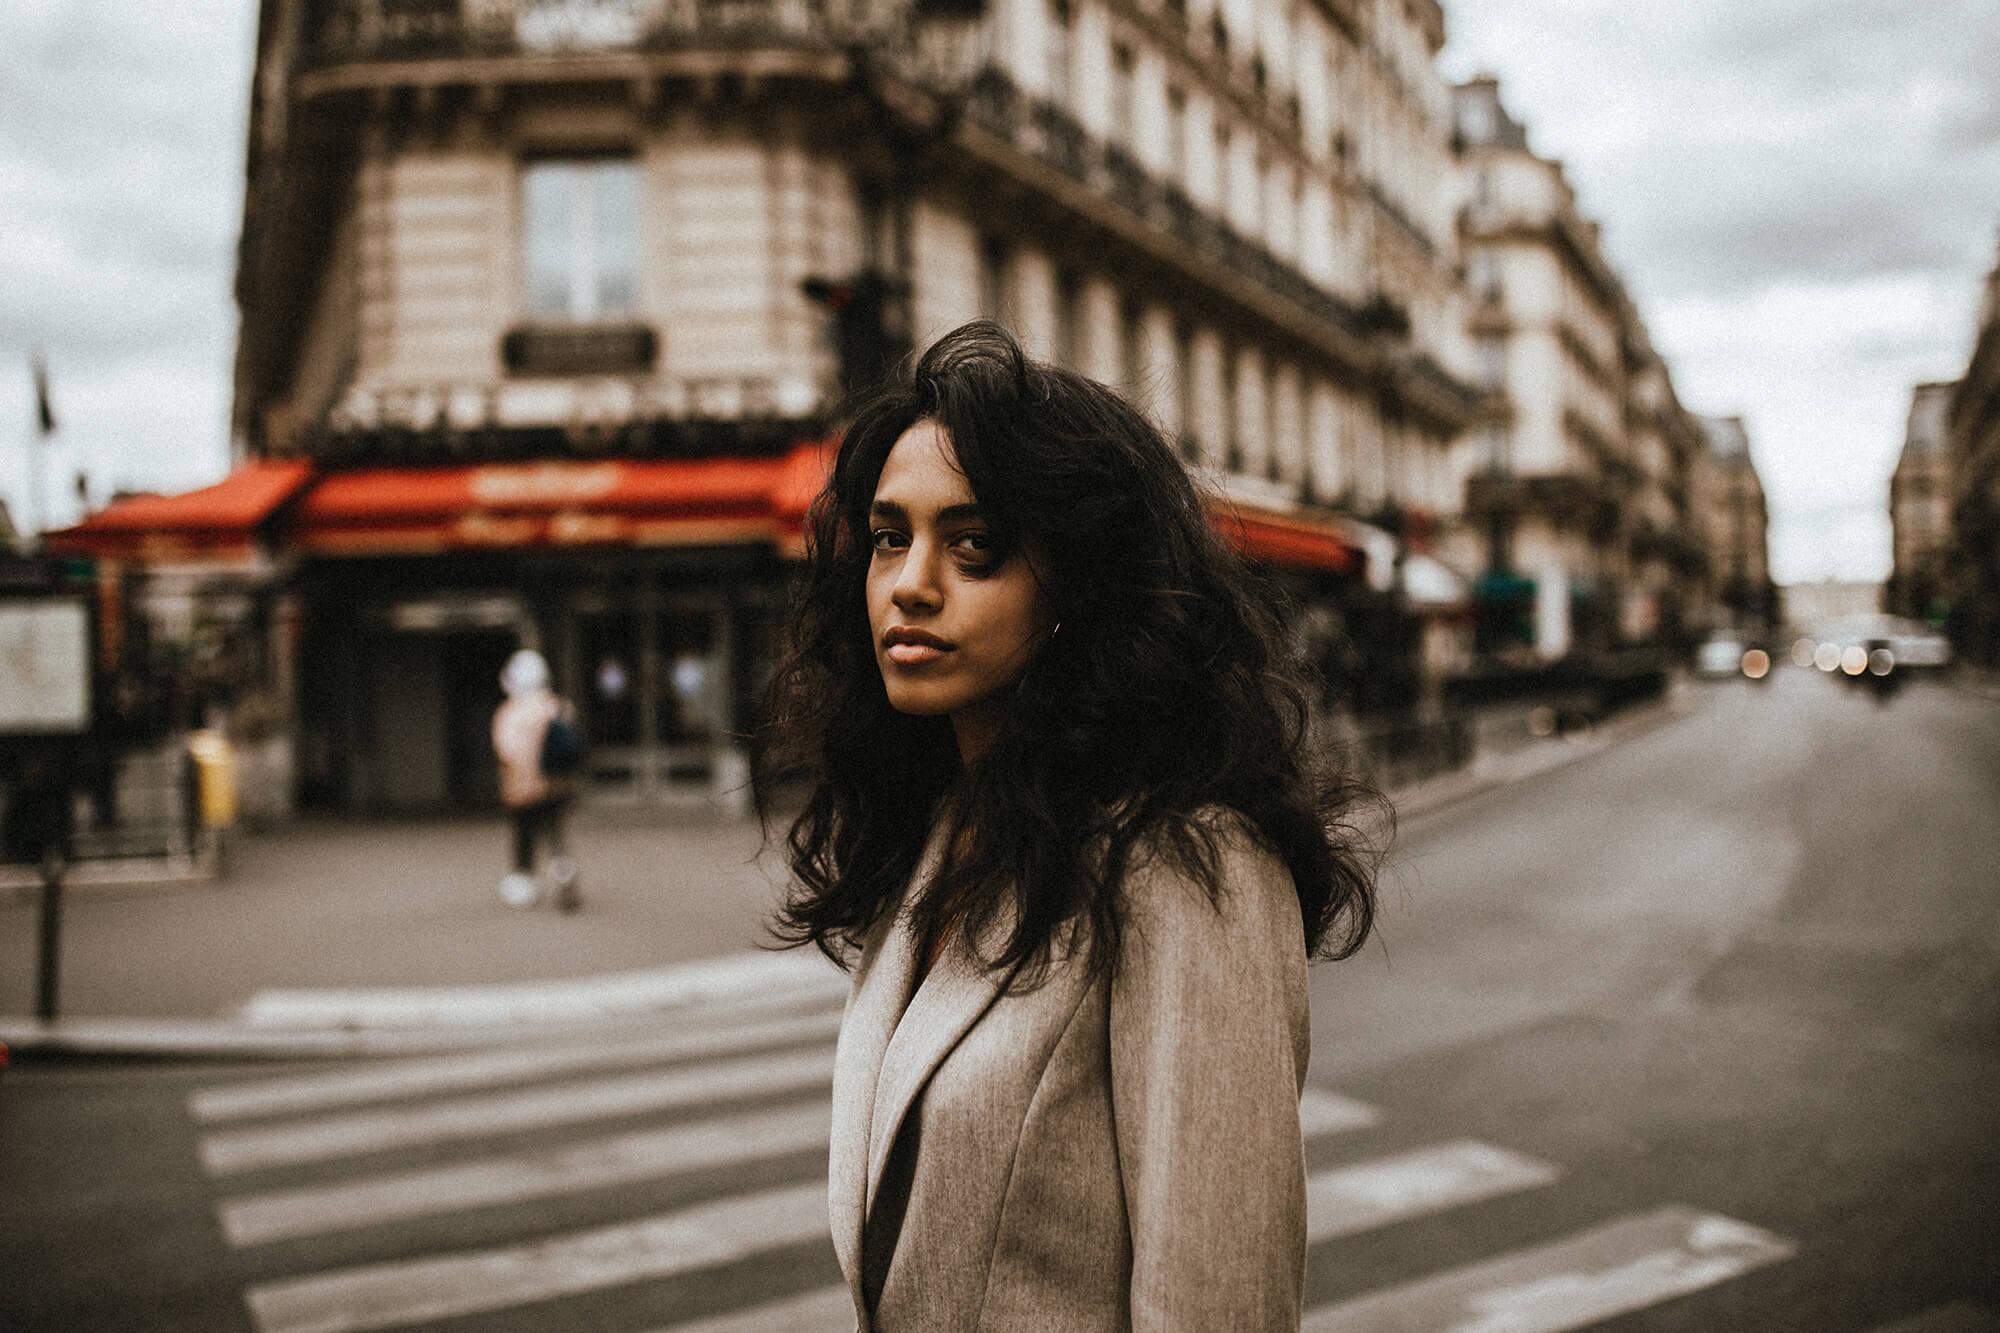 paris - girl - street